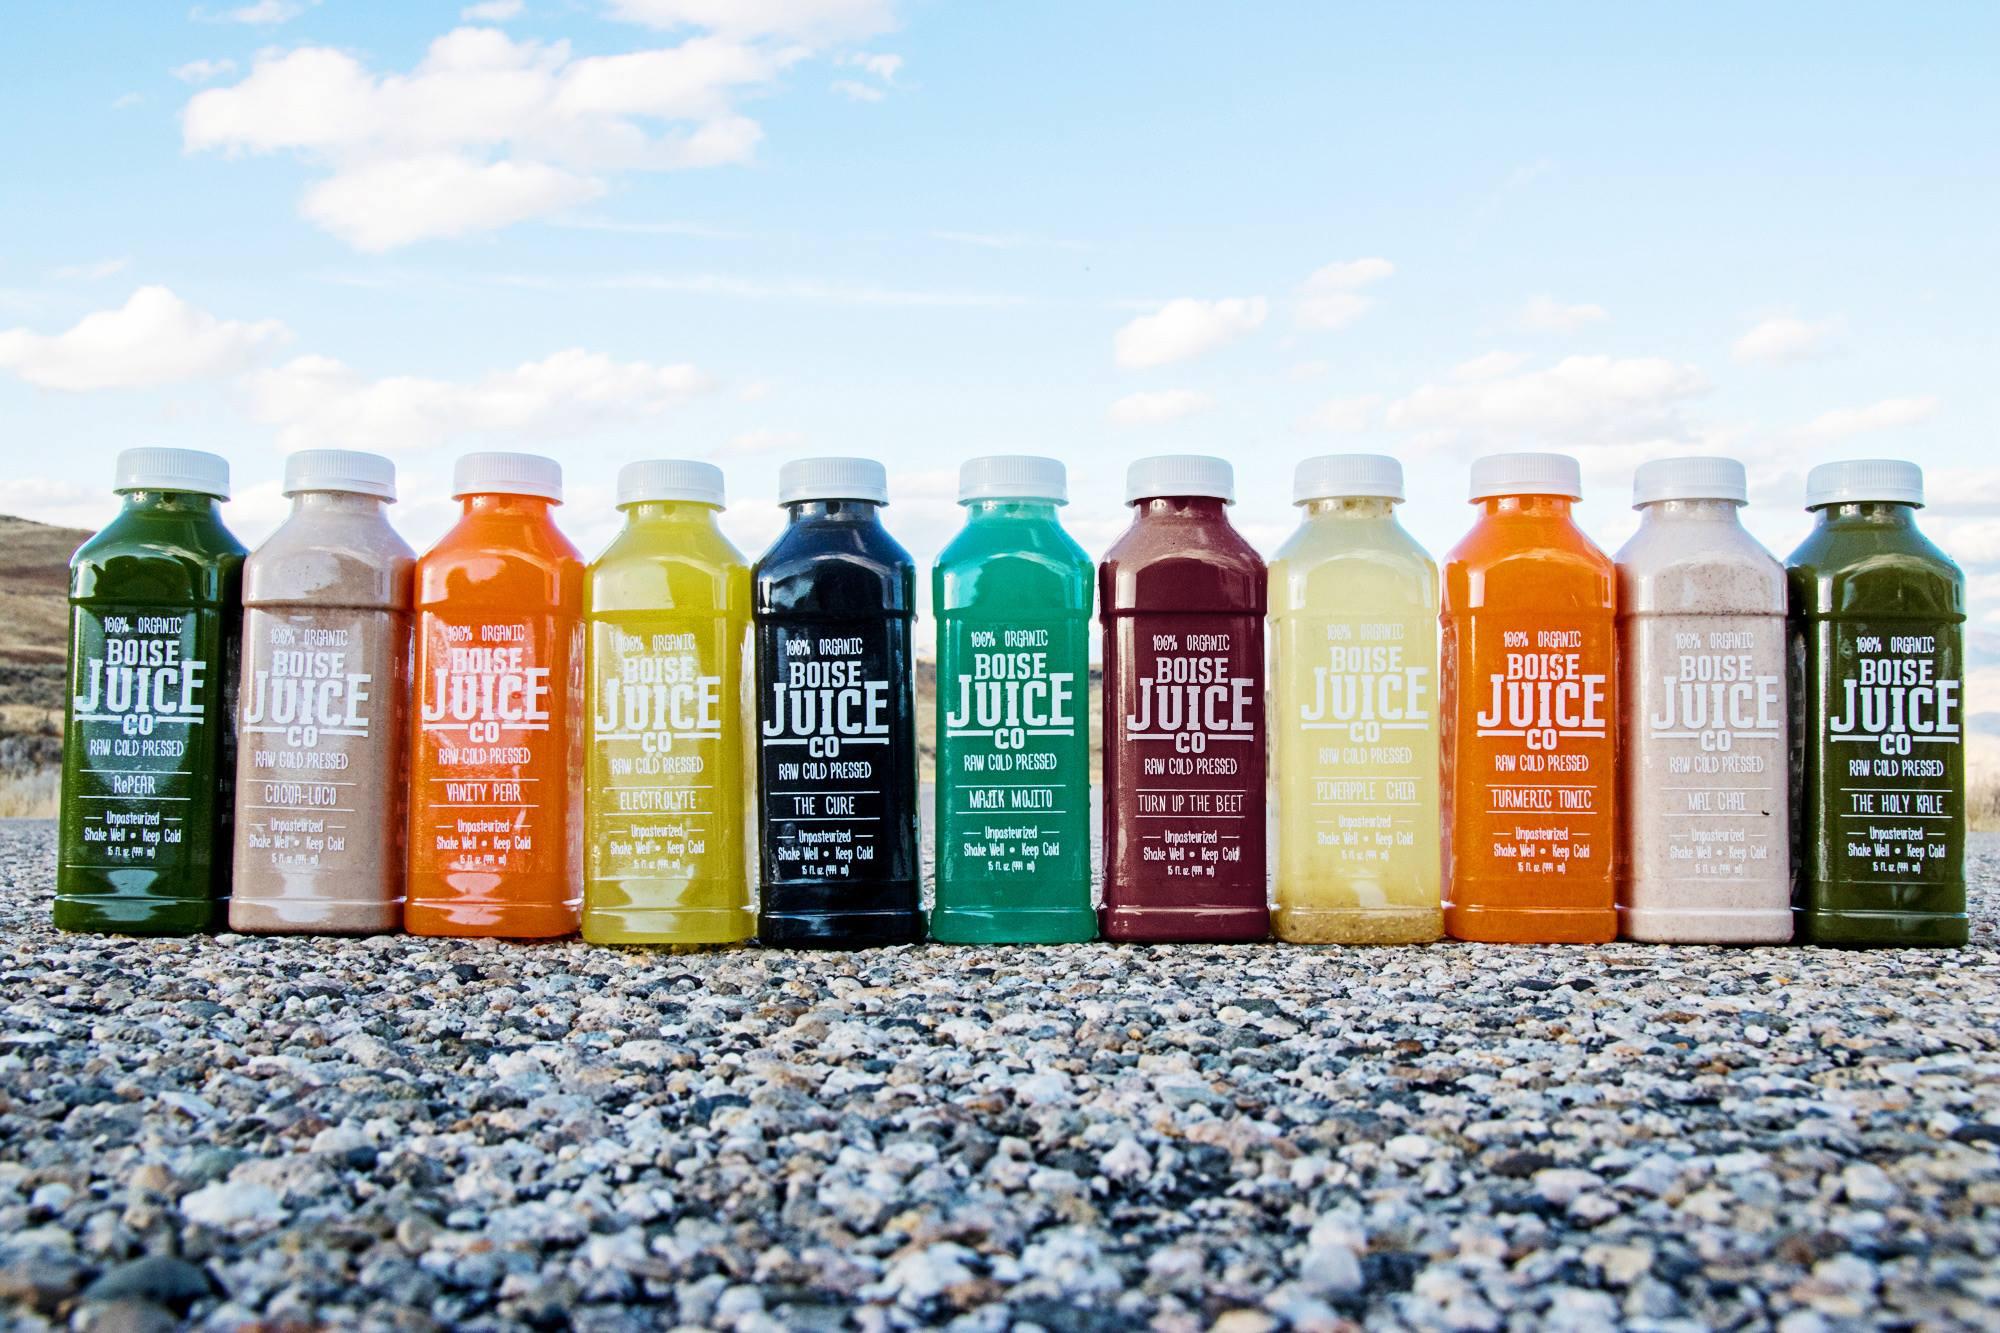 Boise Juice Company